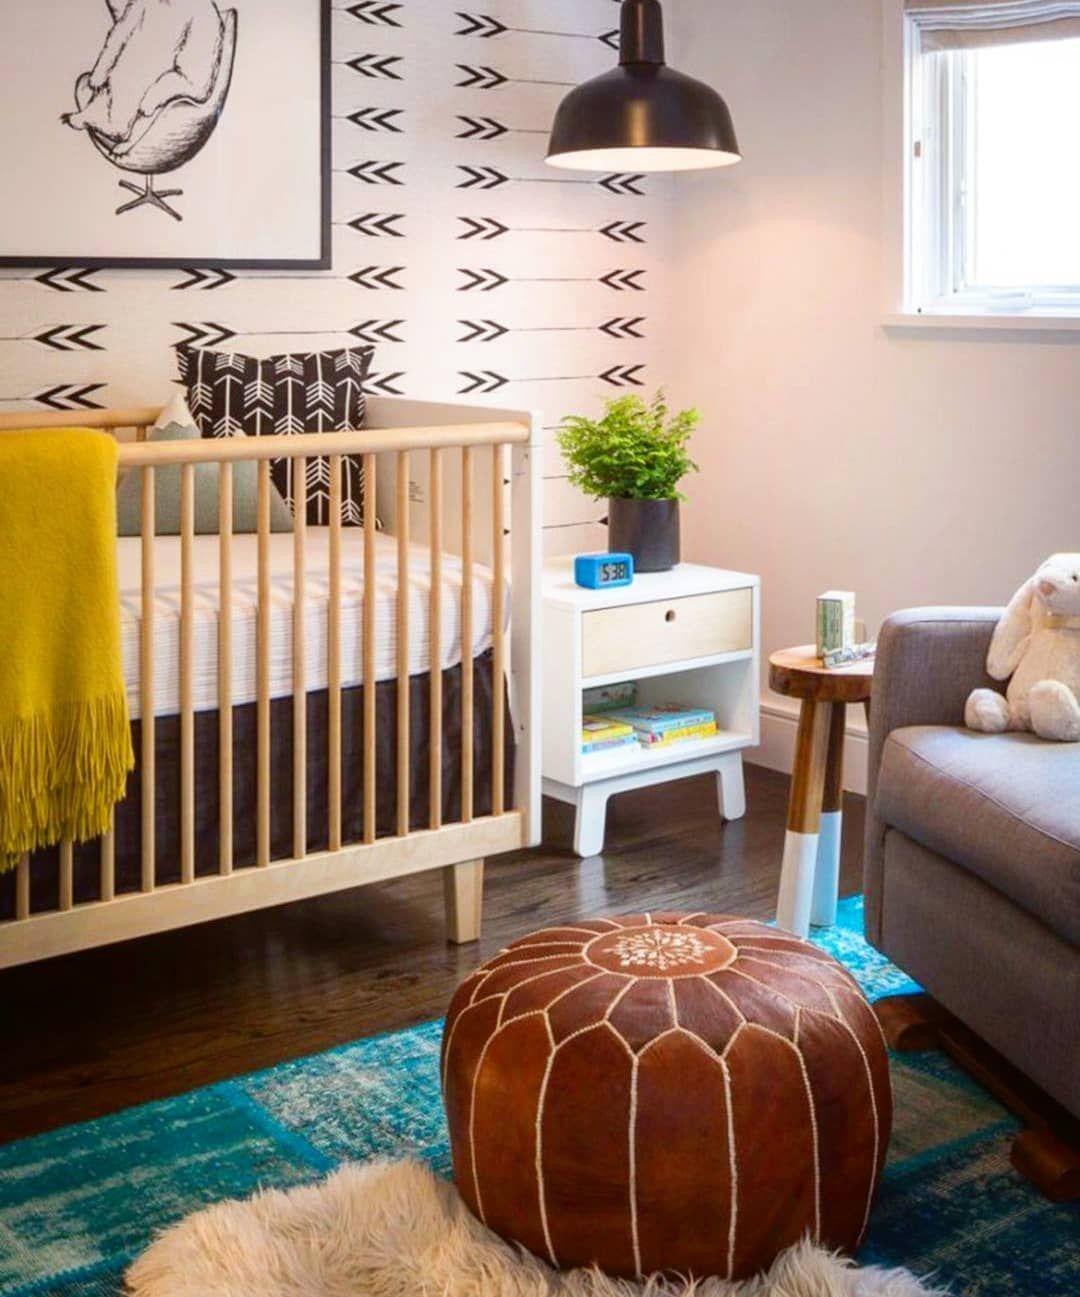 Modern baby bathroom interior design for your baby's joy #inspiration #decoration #design #interiordesign #interiors #furniture #decorstyle…